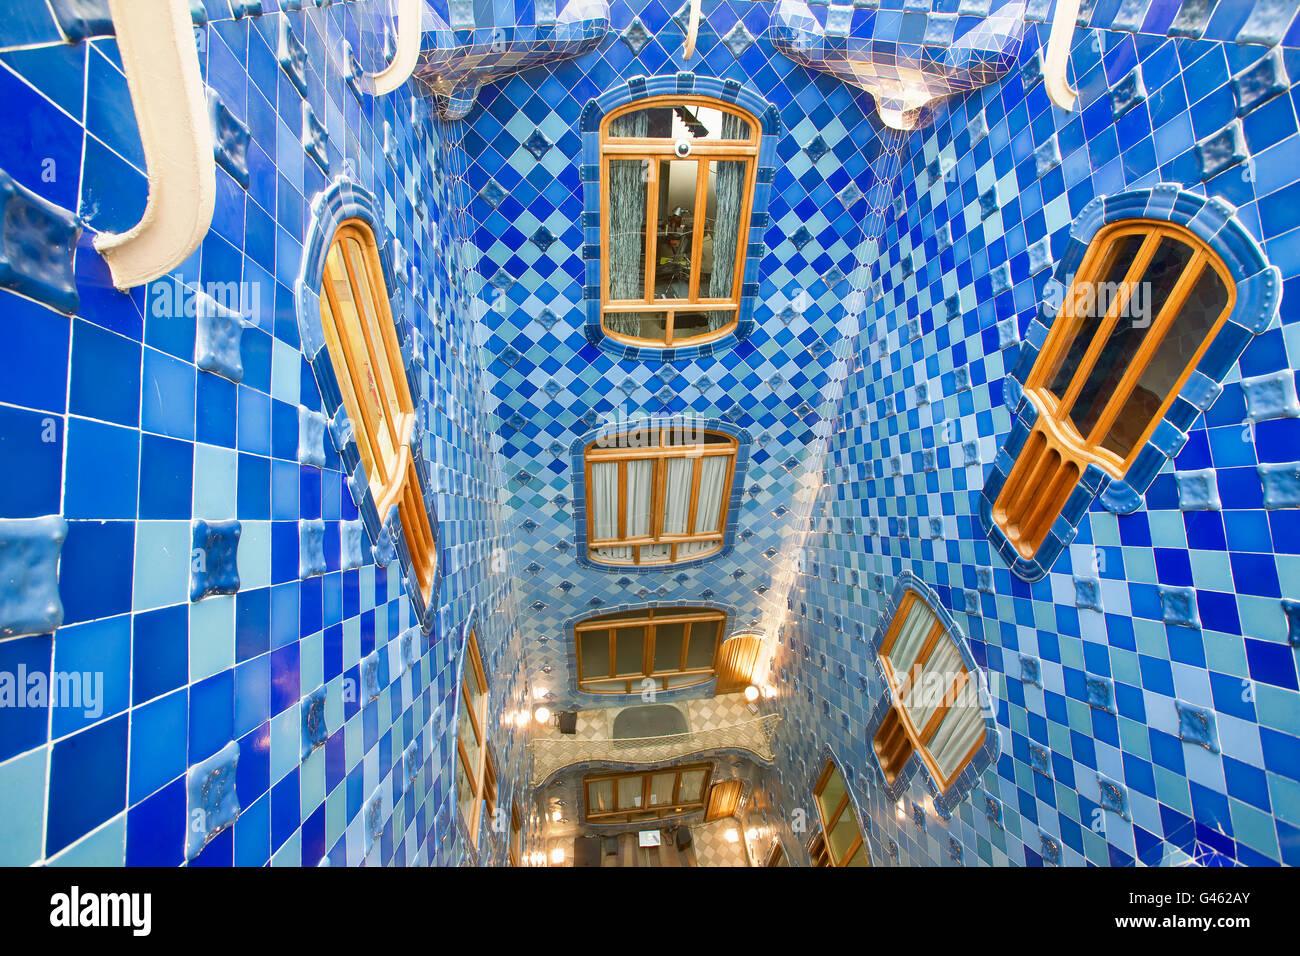 Die Casa Batllo von Gaudi in Barcelona Stockbild